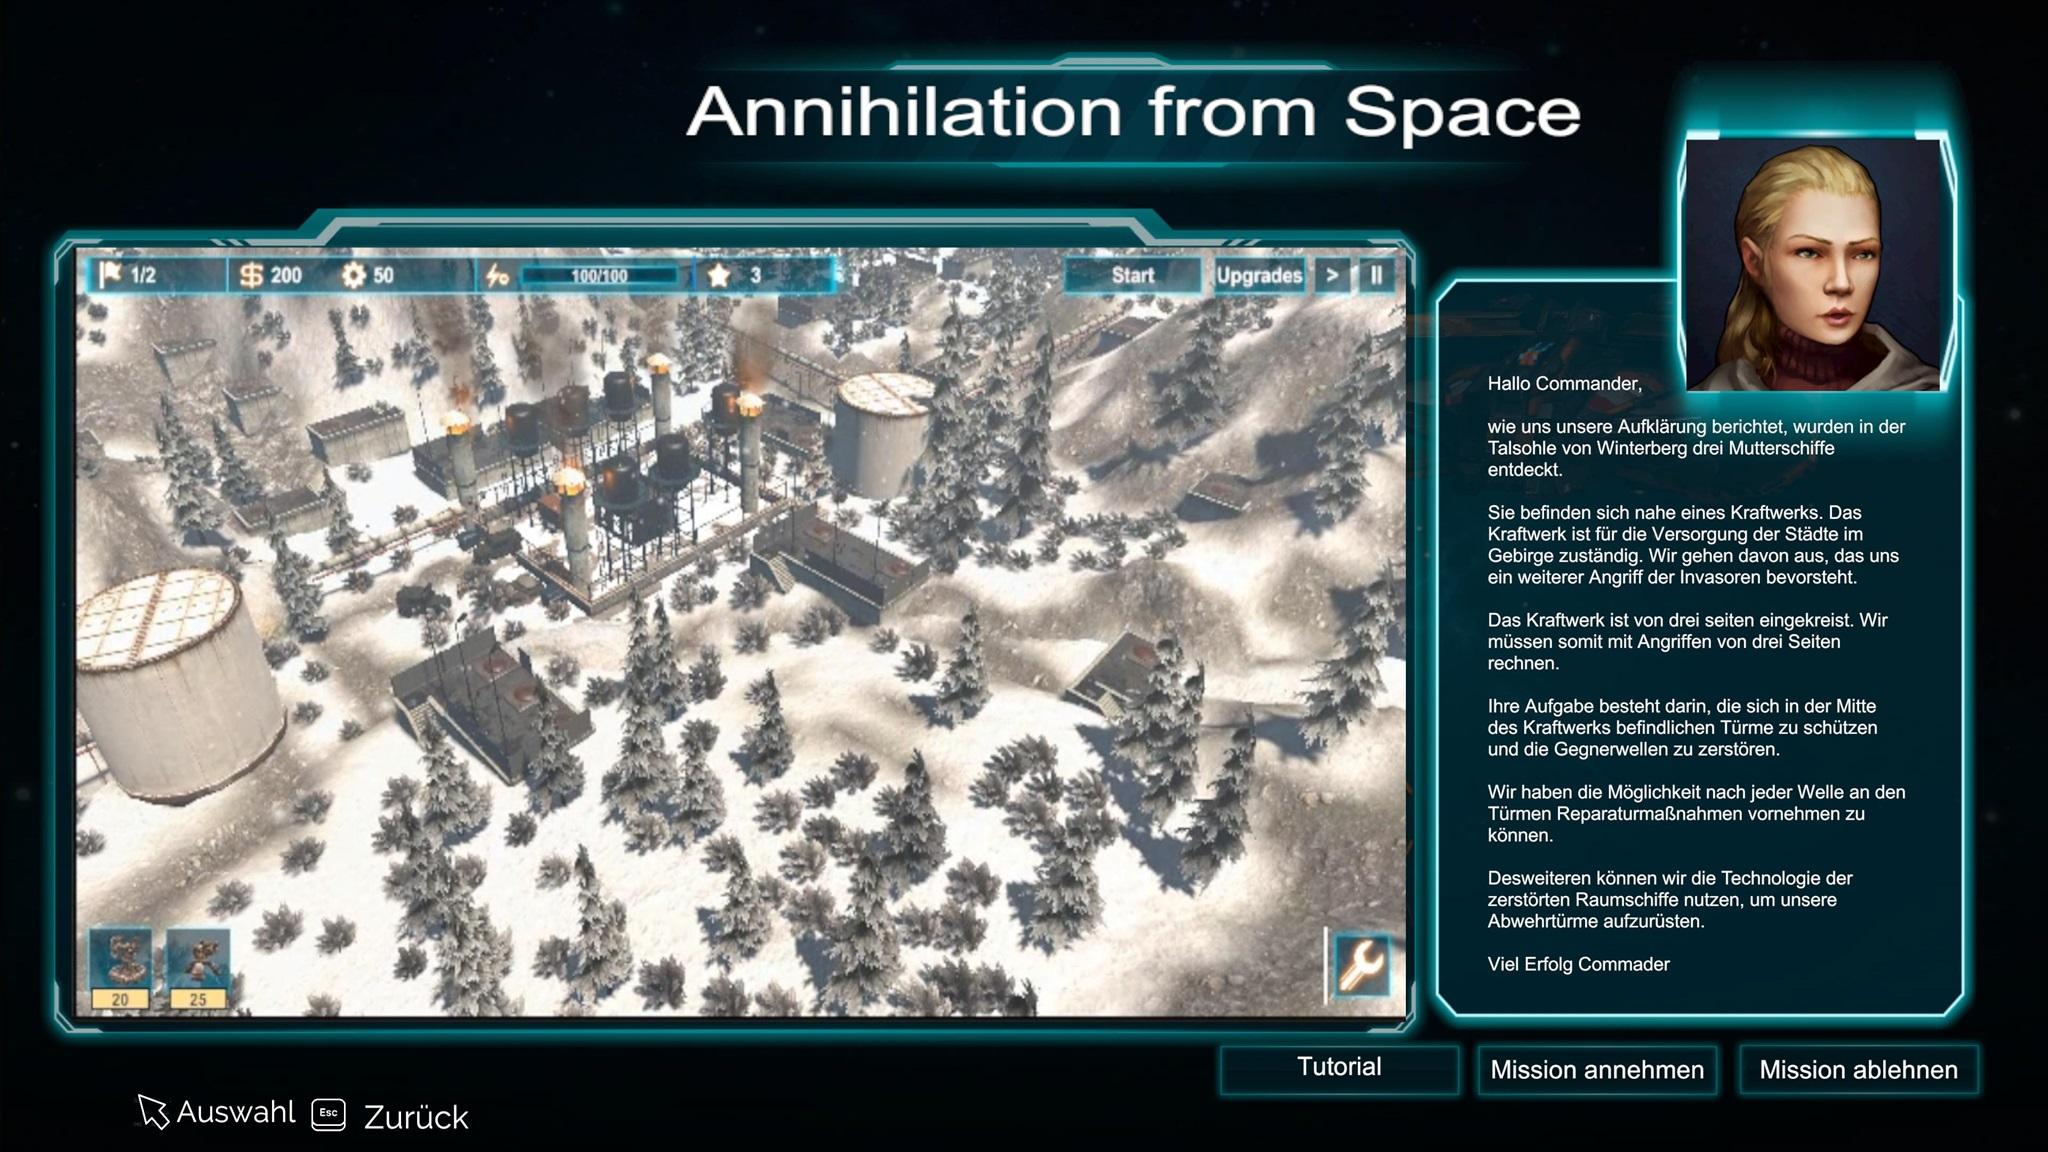 tower-defense-scifi-2021-02-04-16-44-21-56-large.jpg